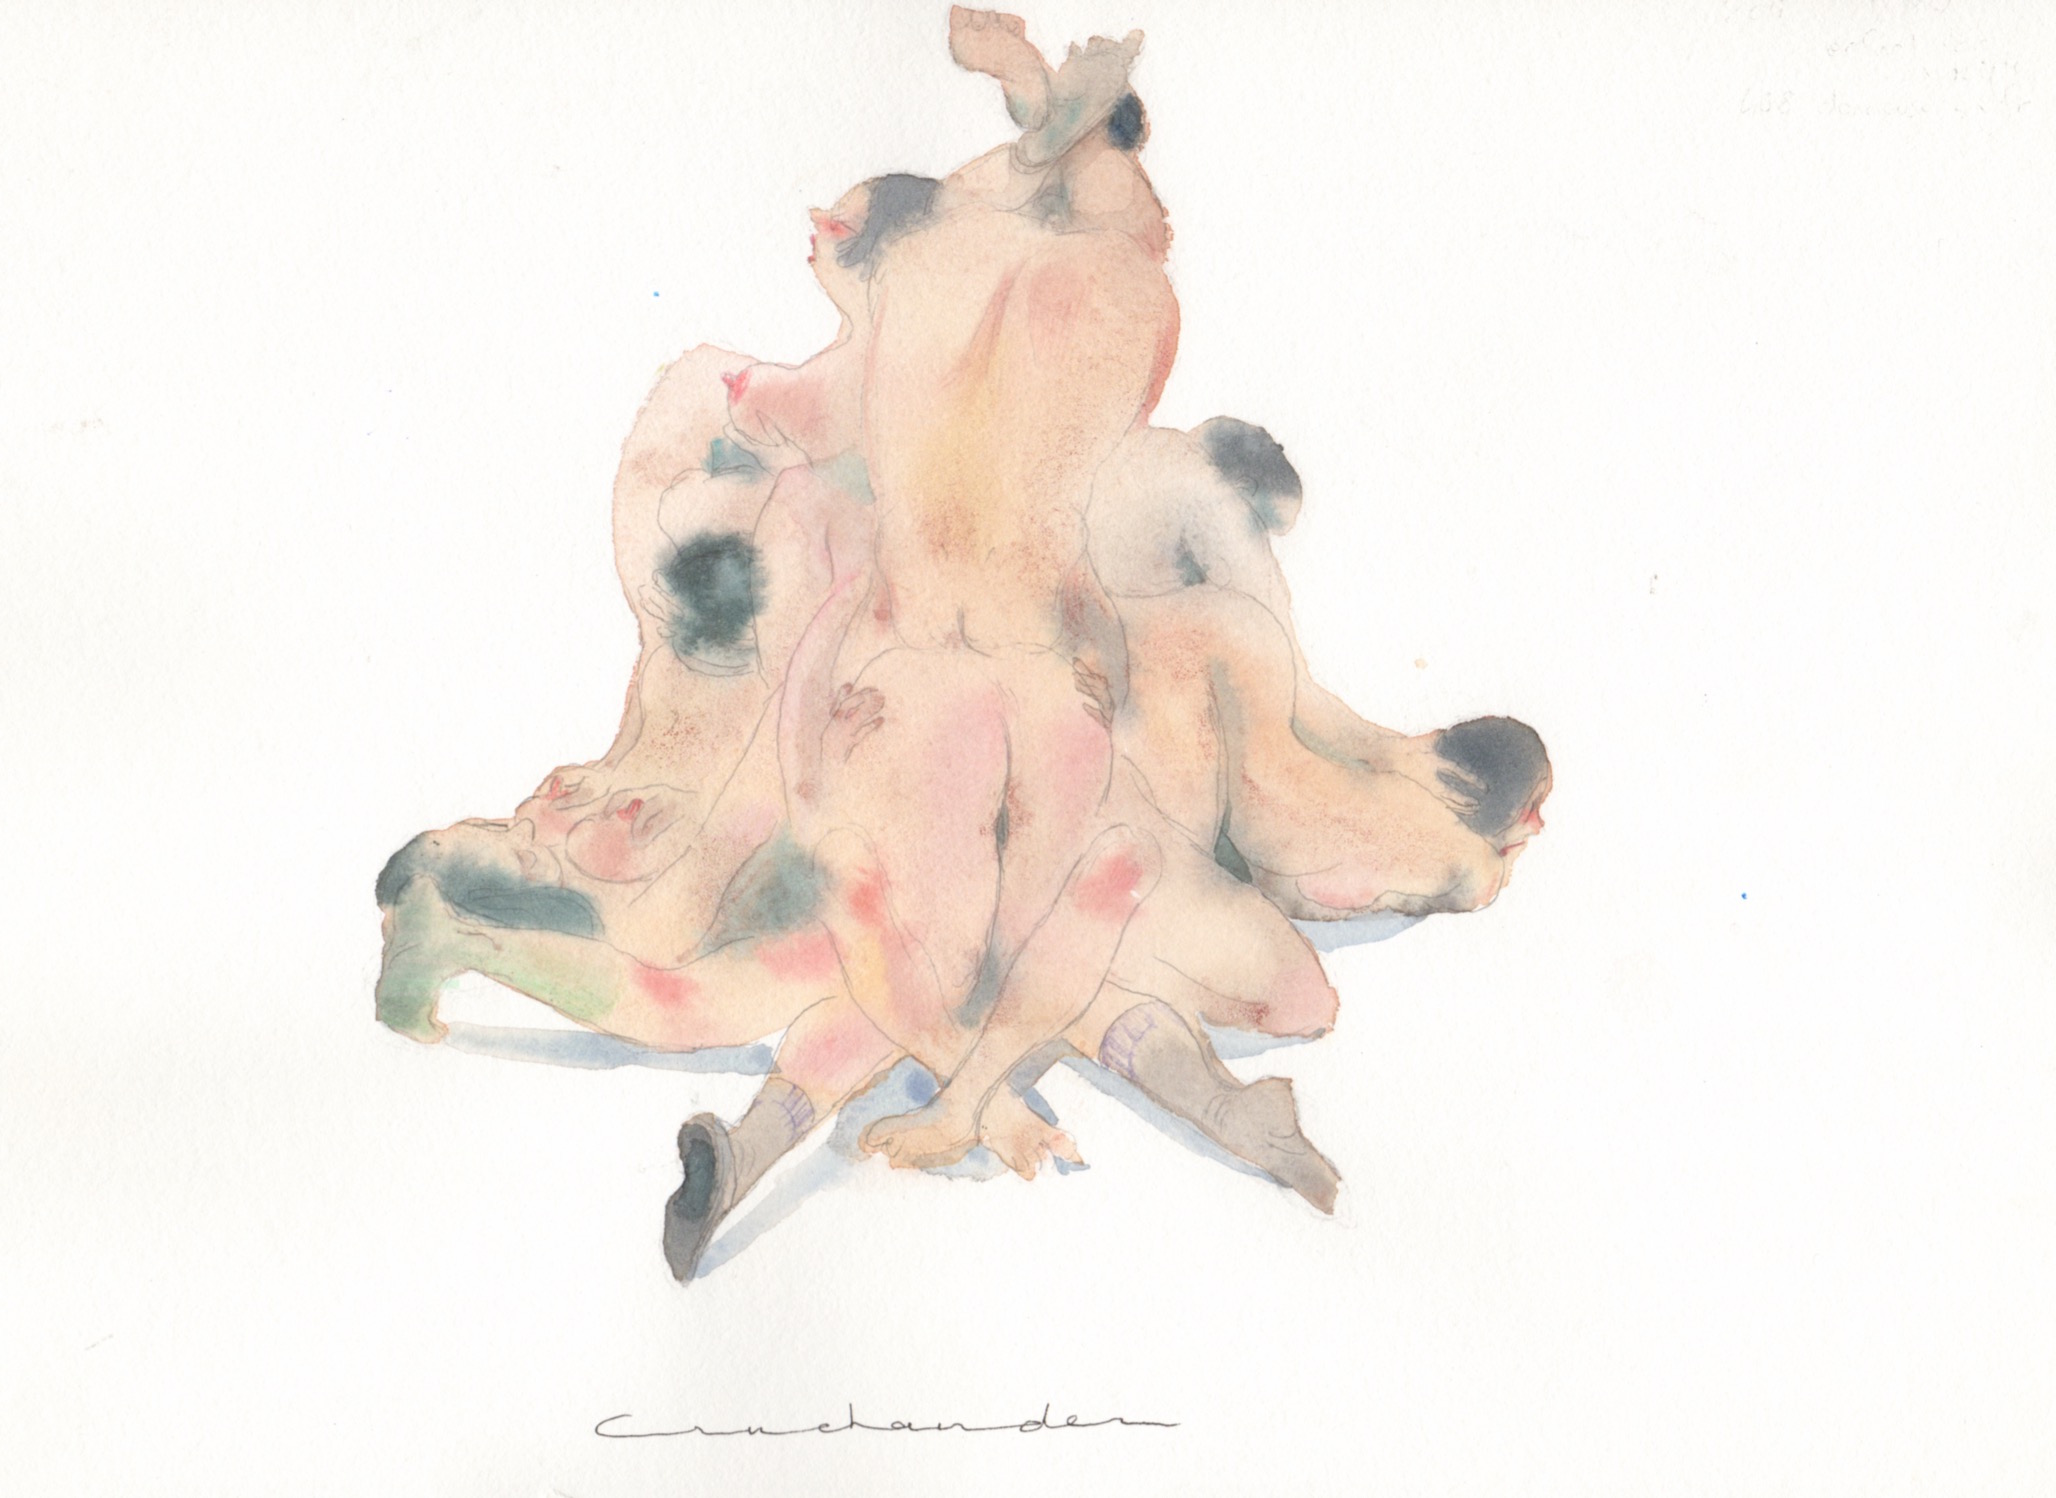 Chloé Cruchaudet | GALERIE TREIZE-DIX / PLAN A PLUSIEURS | Chloé Cruchaudet